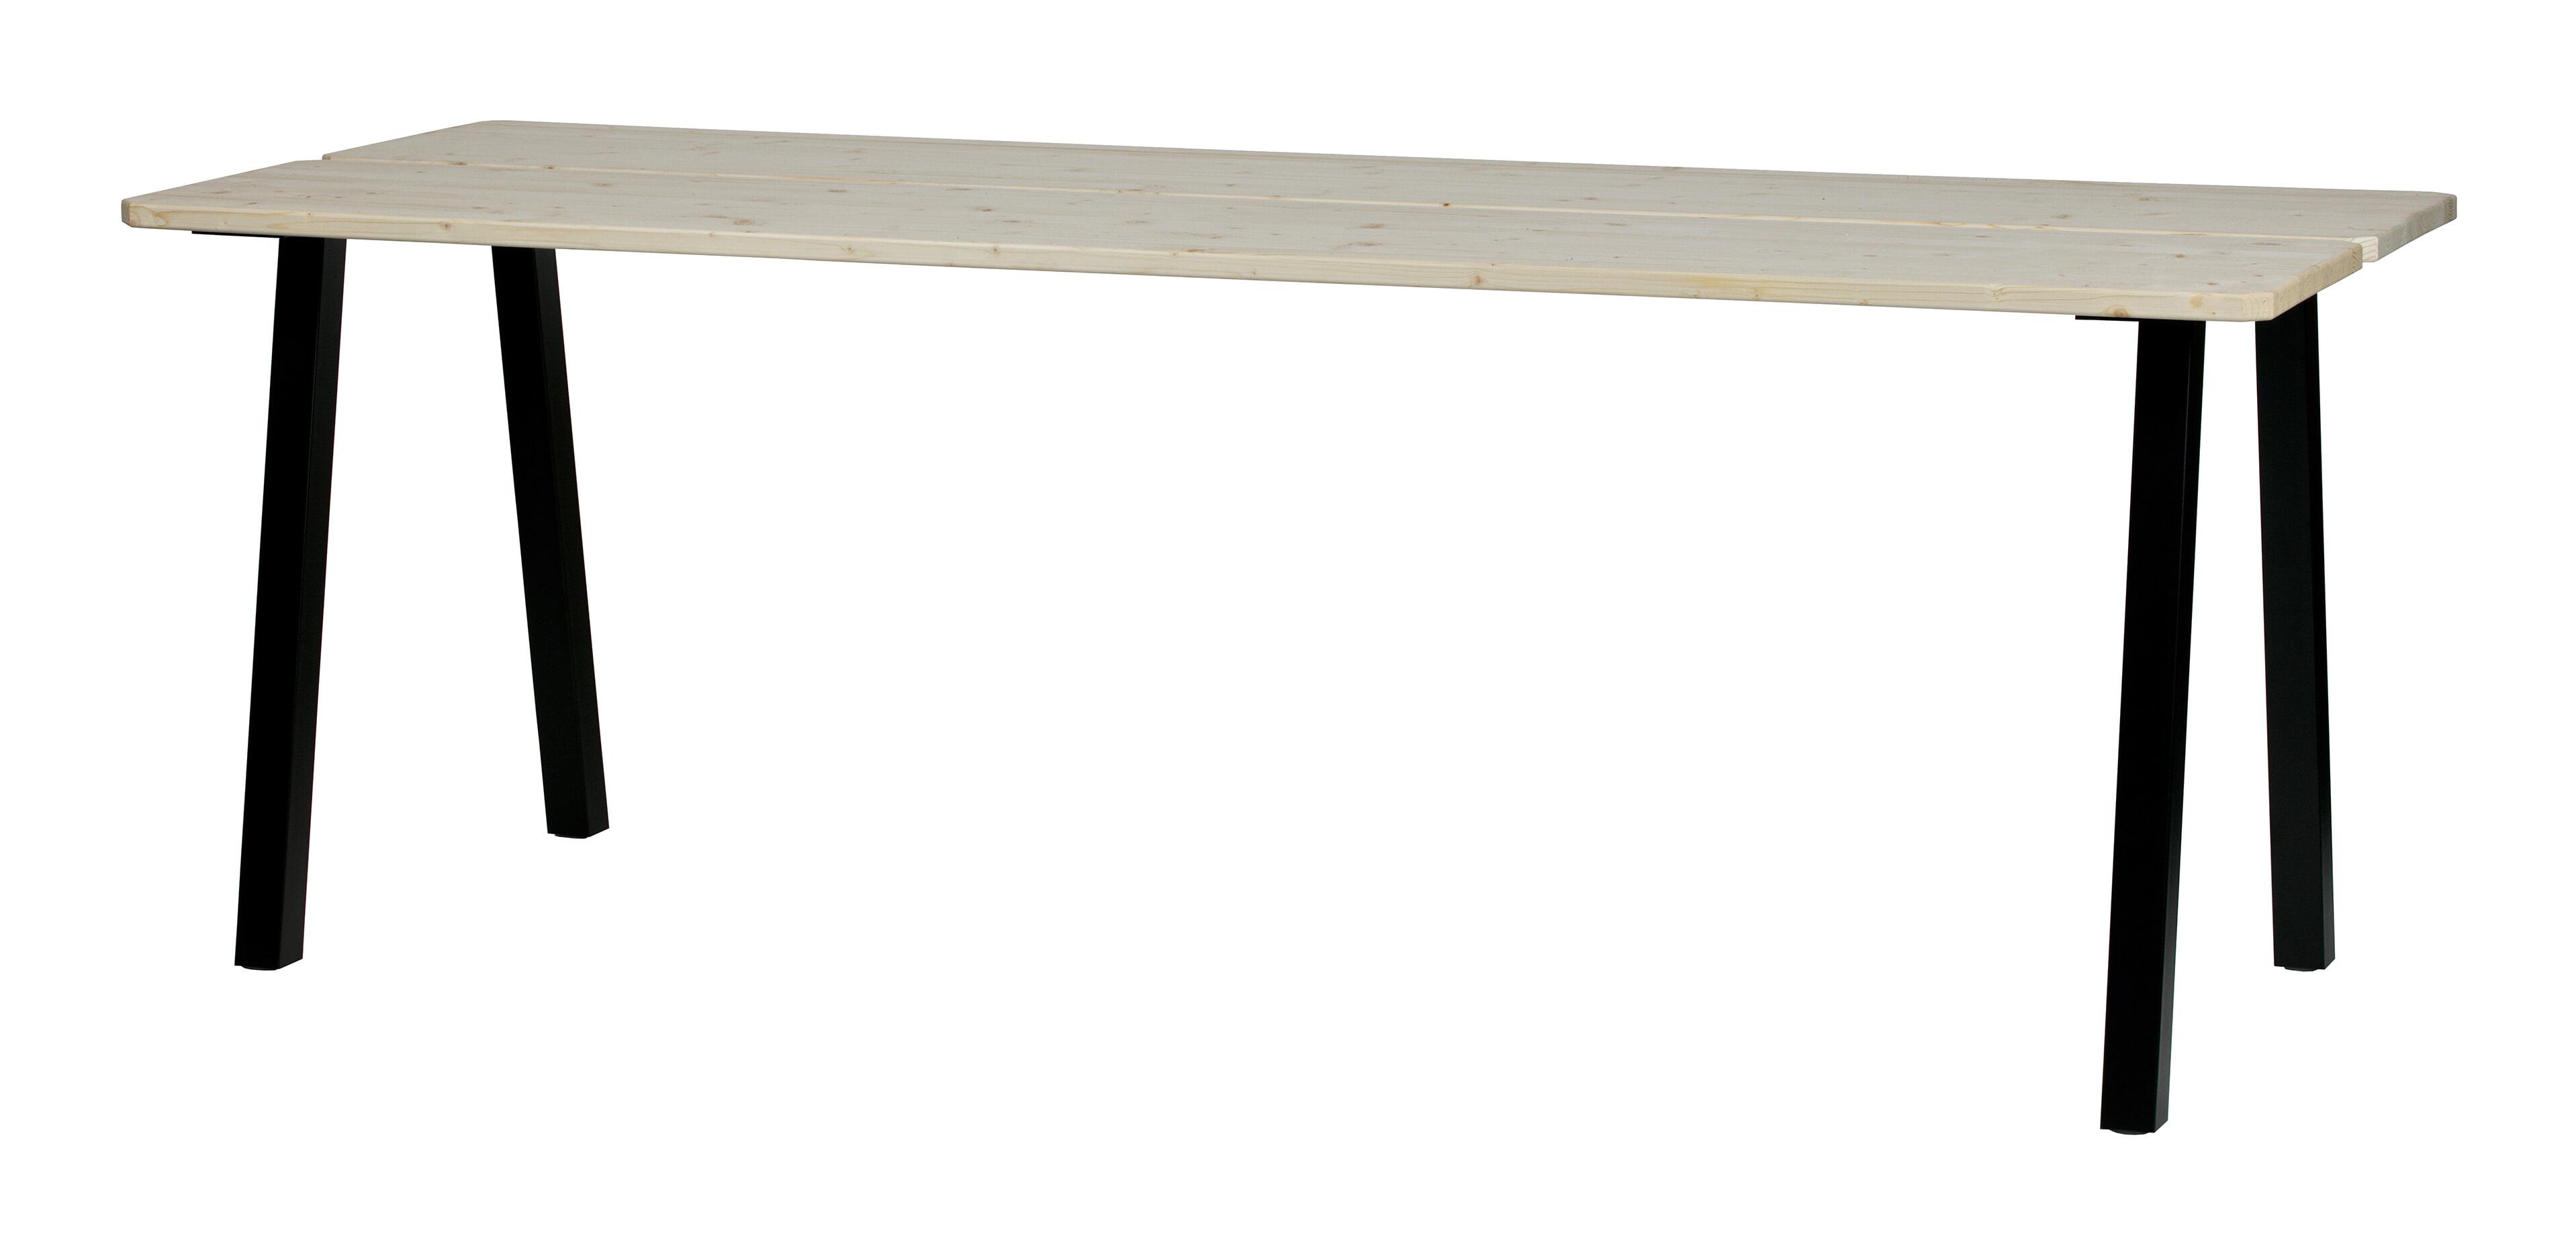 WOOOD Eettafel 'Triomf' 210 x 77cm, kleur Onbehandeld